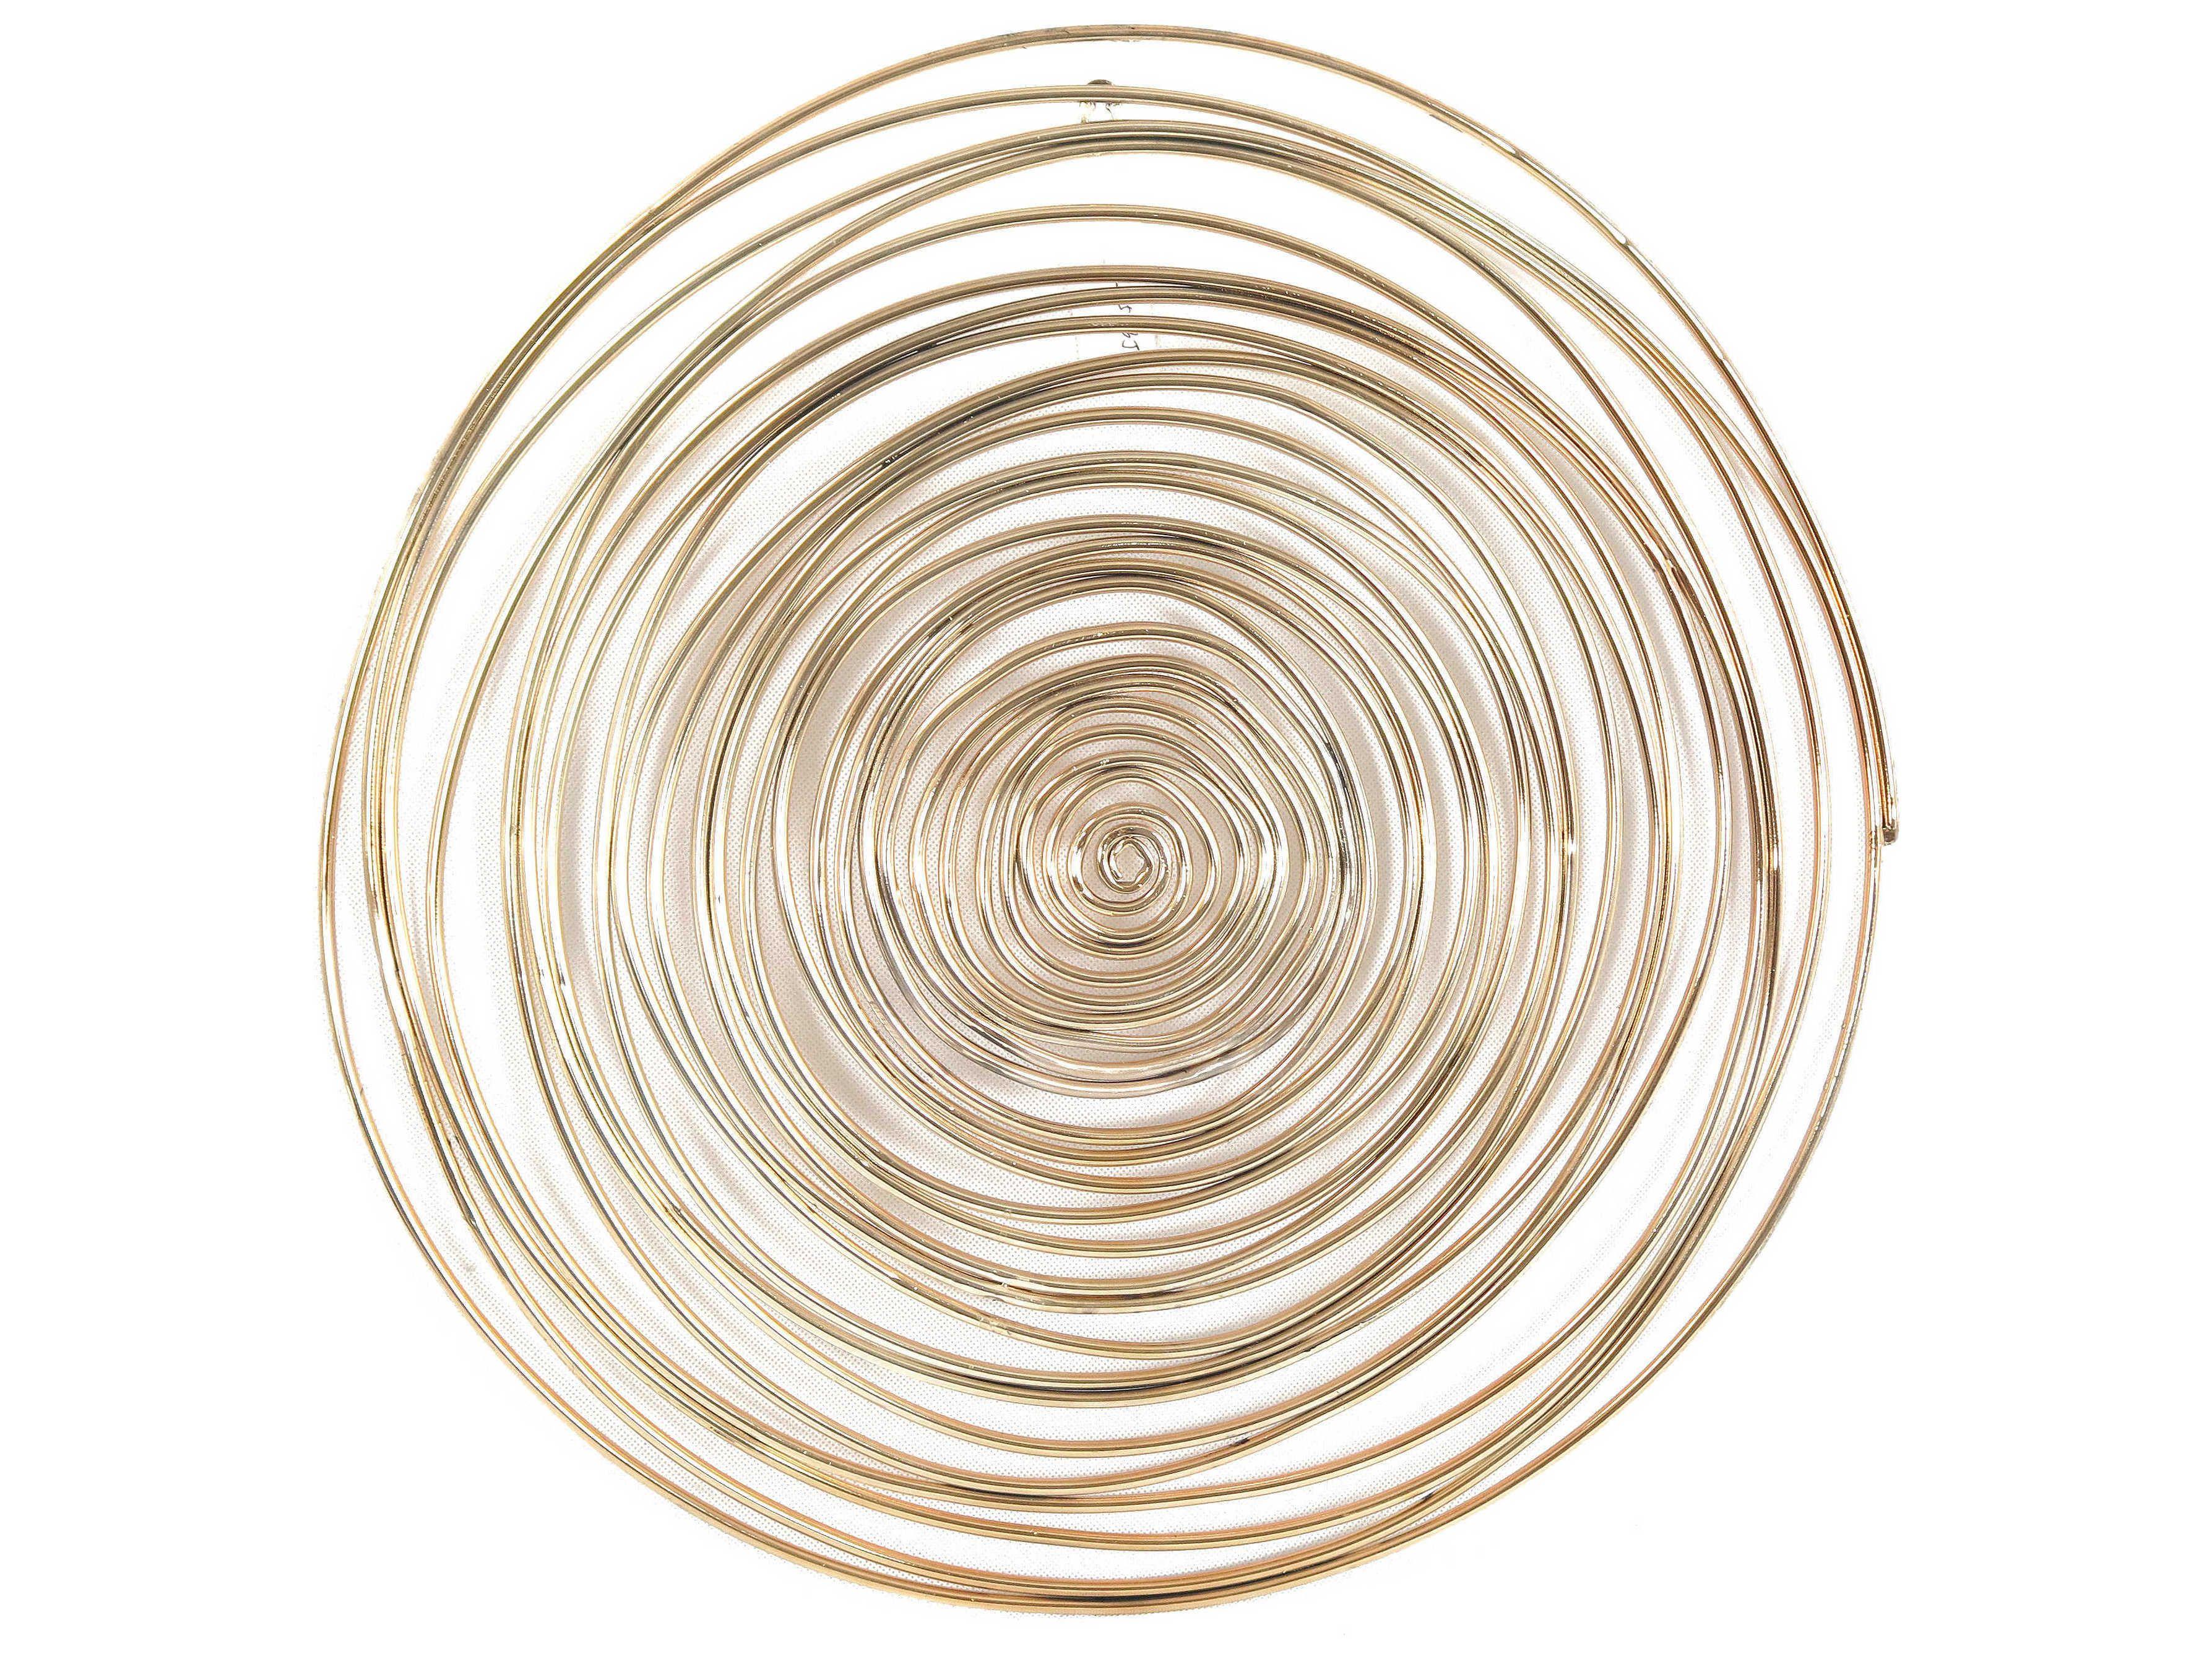 Luxury Home Decor Shopping For Indoor Outdoor Gold Wall Decor Gold Metal Wall Art Modern Metal Wall Art